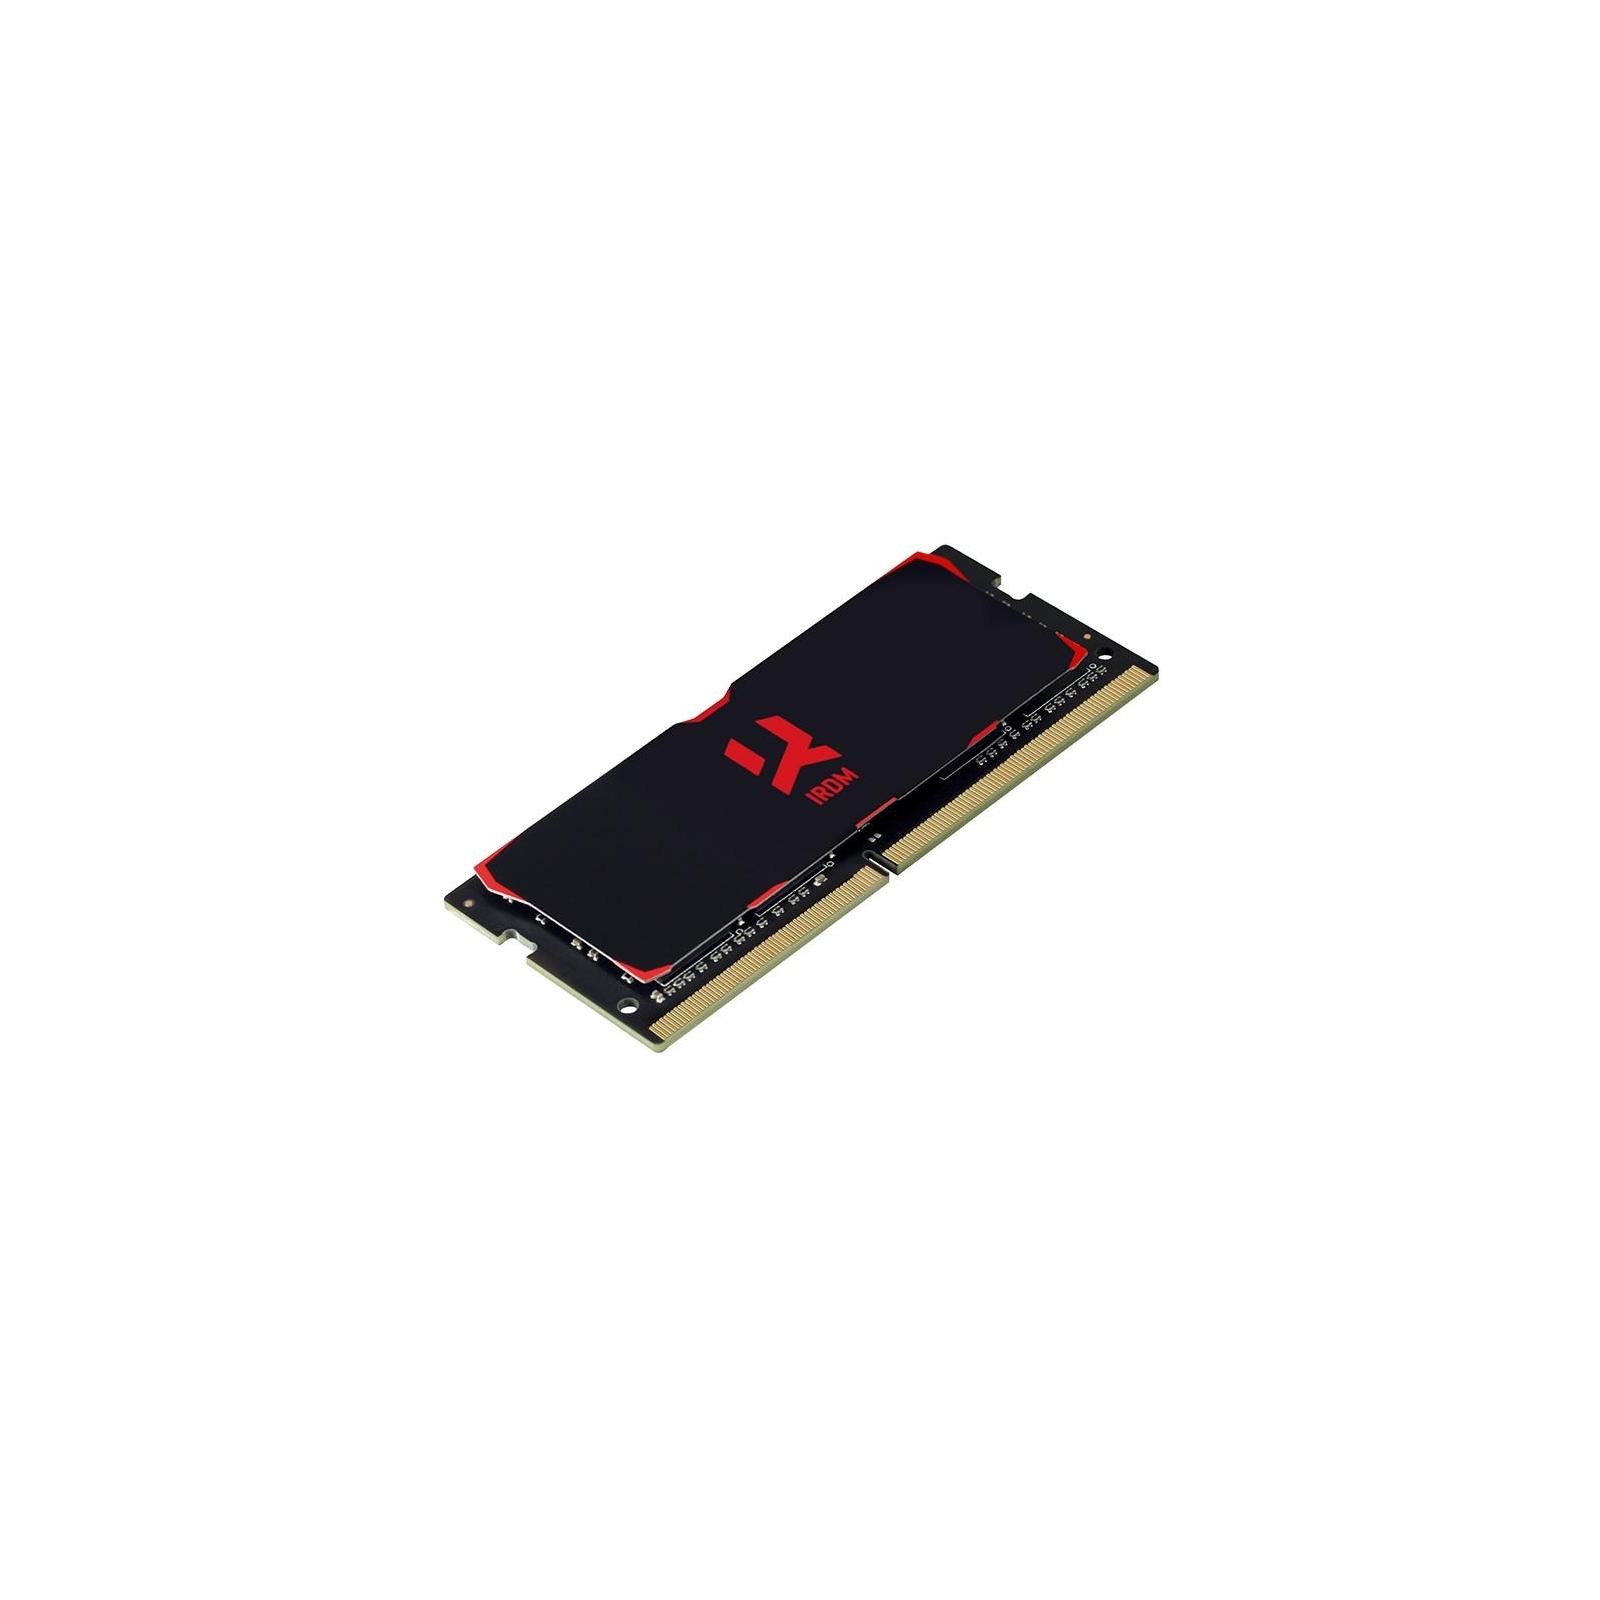 Модуль памяти для ноутбука SoDIMM DDR4 16GB 2400 MHz Iridium Goodram (IR-2400S464L15/16G) изображение 2